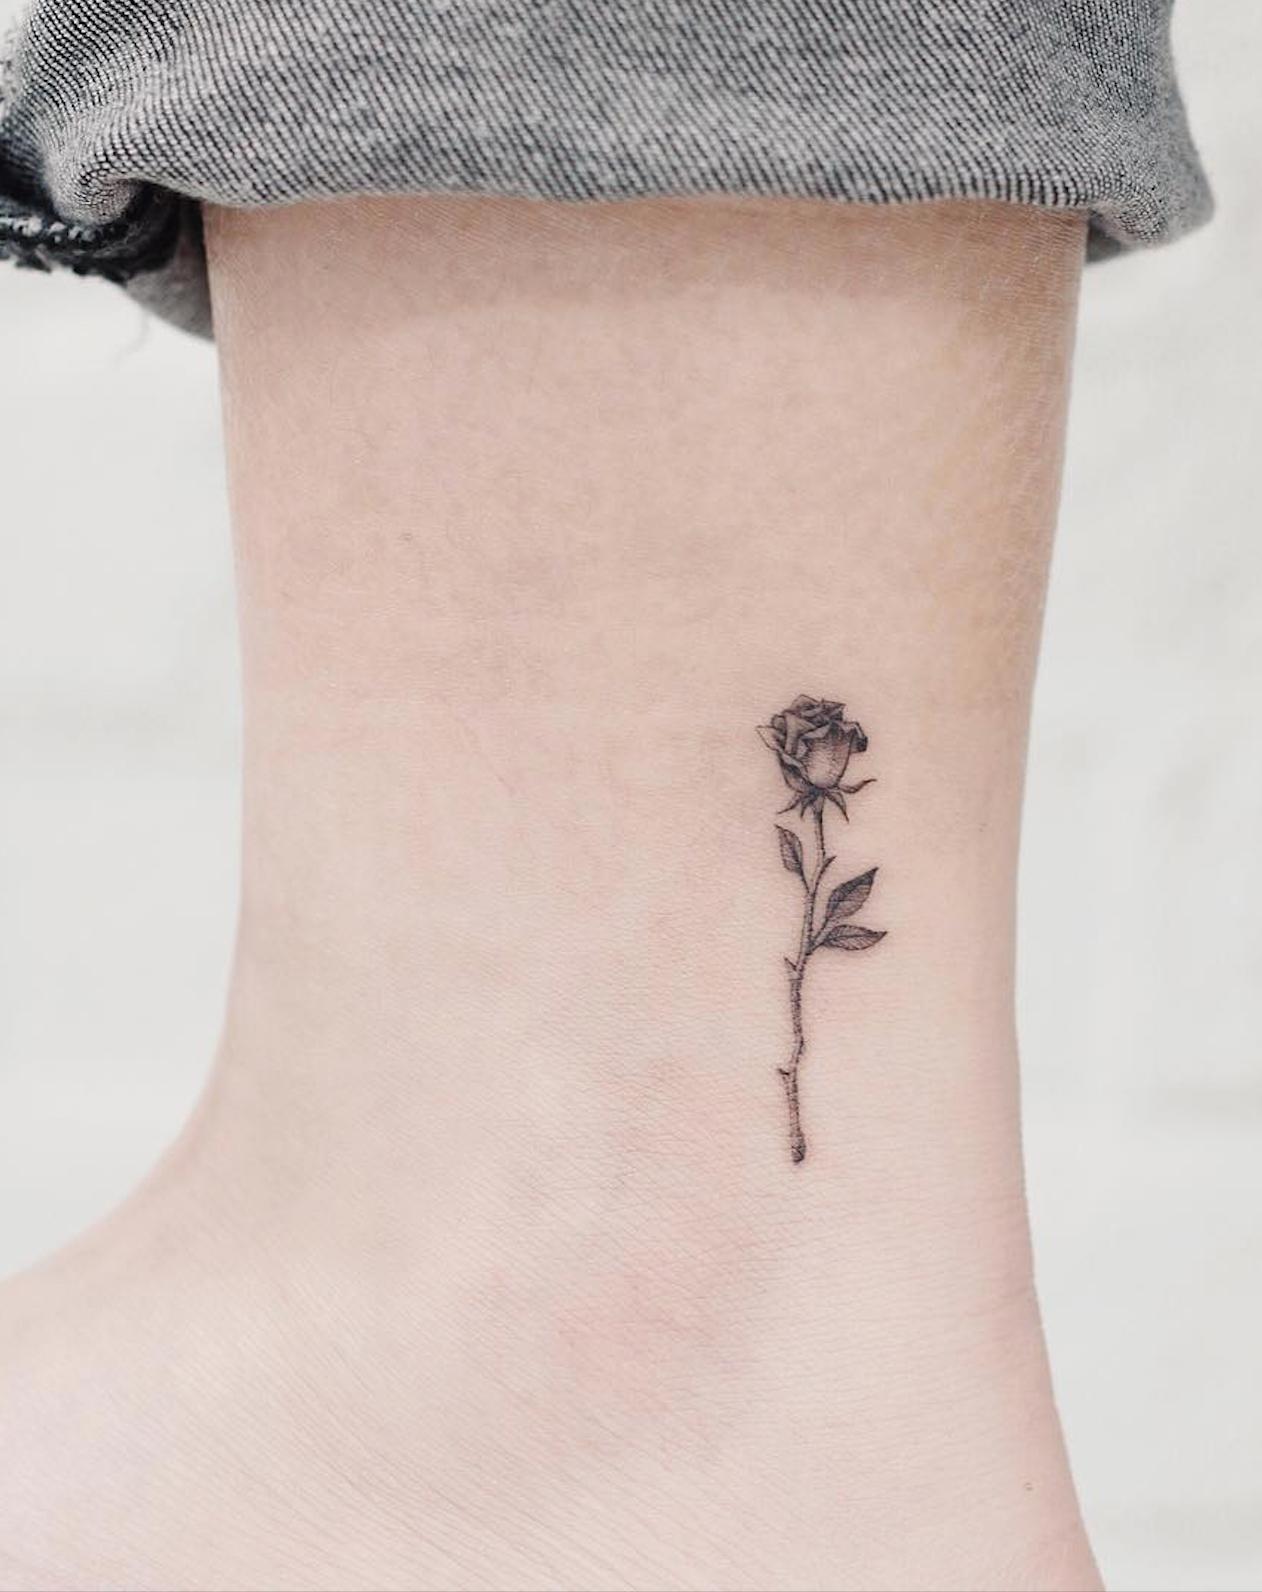 Minimalist Flower Tattoos According To Your Personality Tattooink Feminine Tattoos Small Tattoos Artsy Tattoos